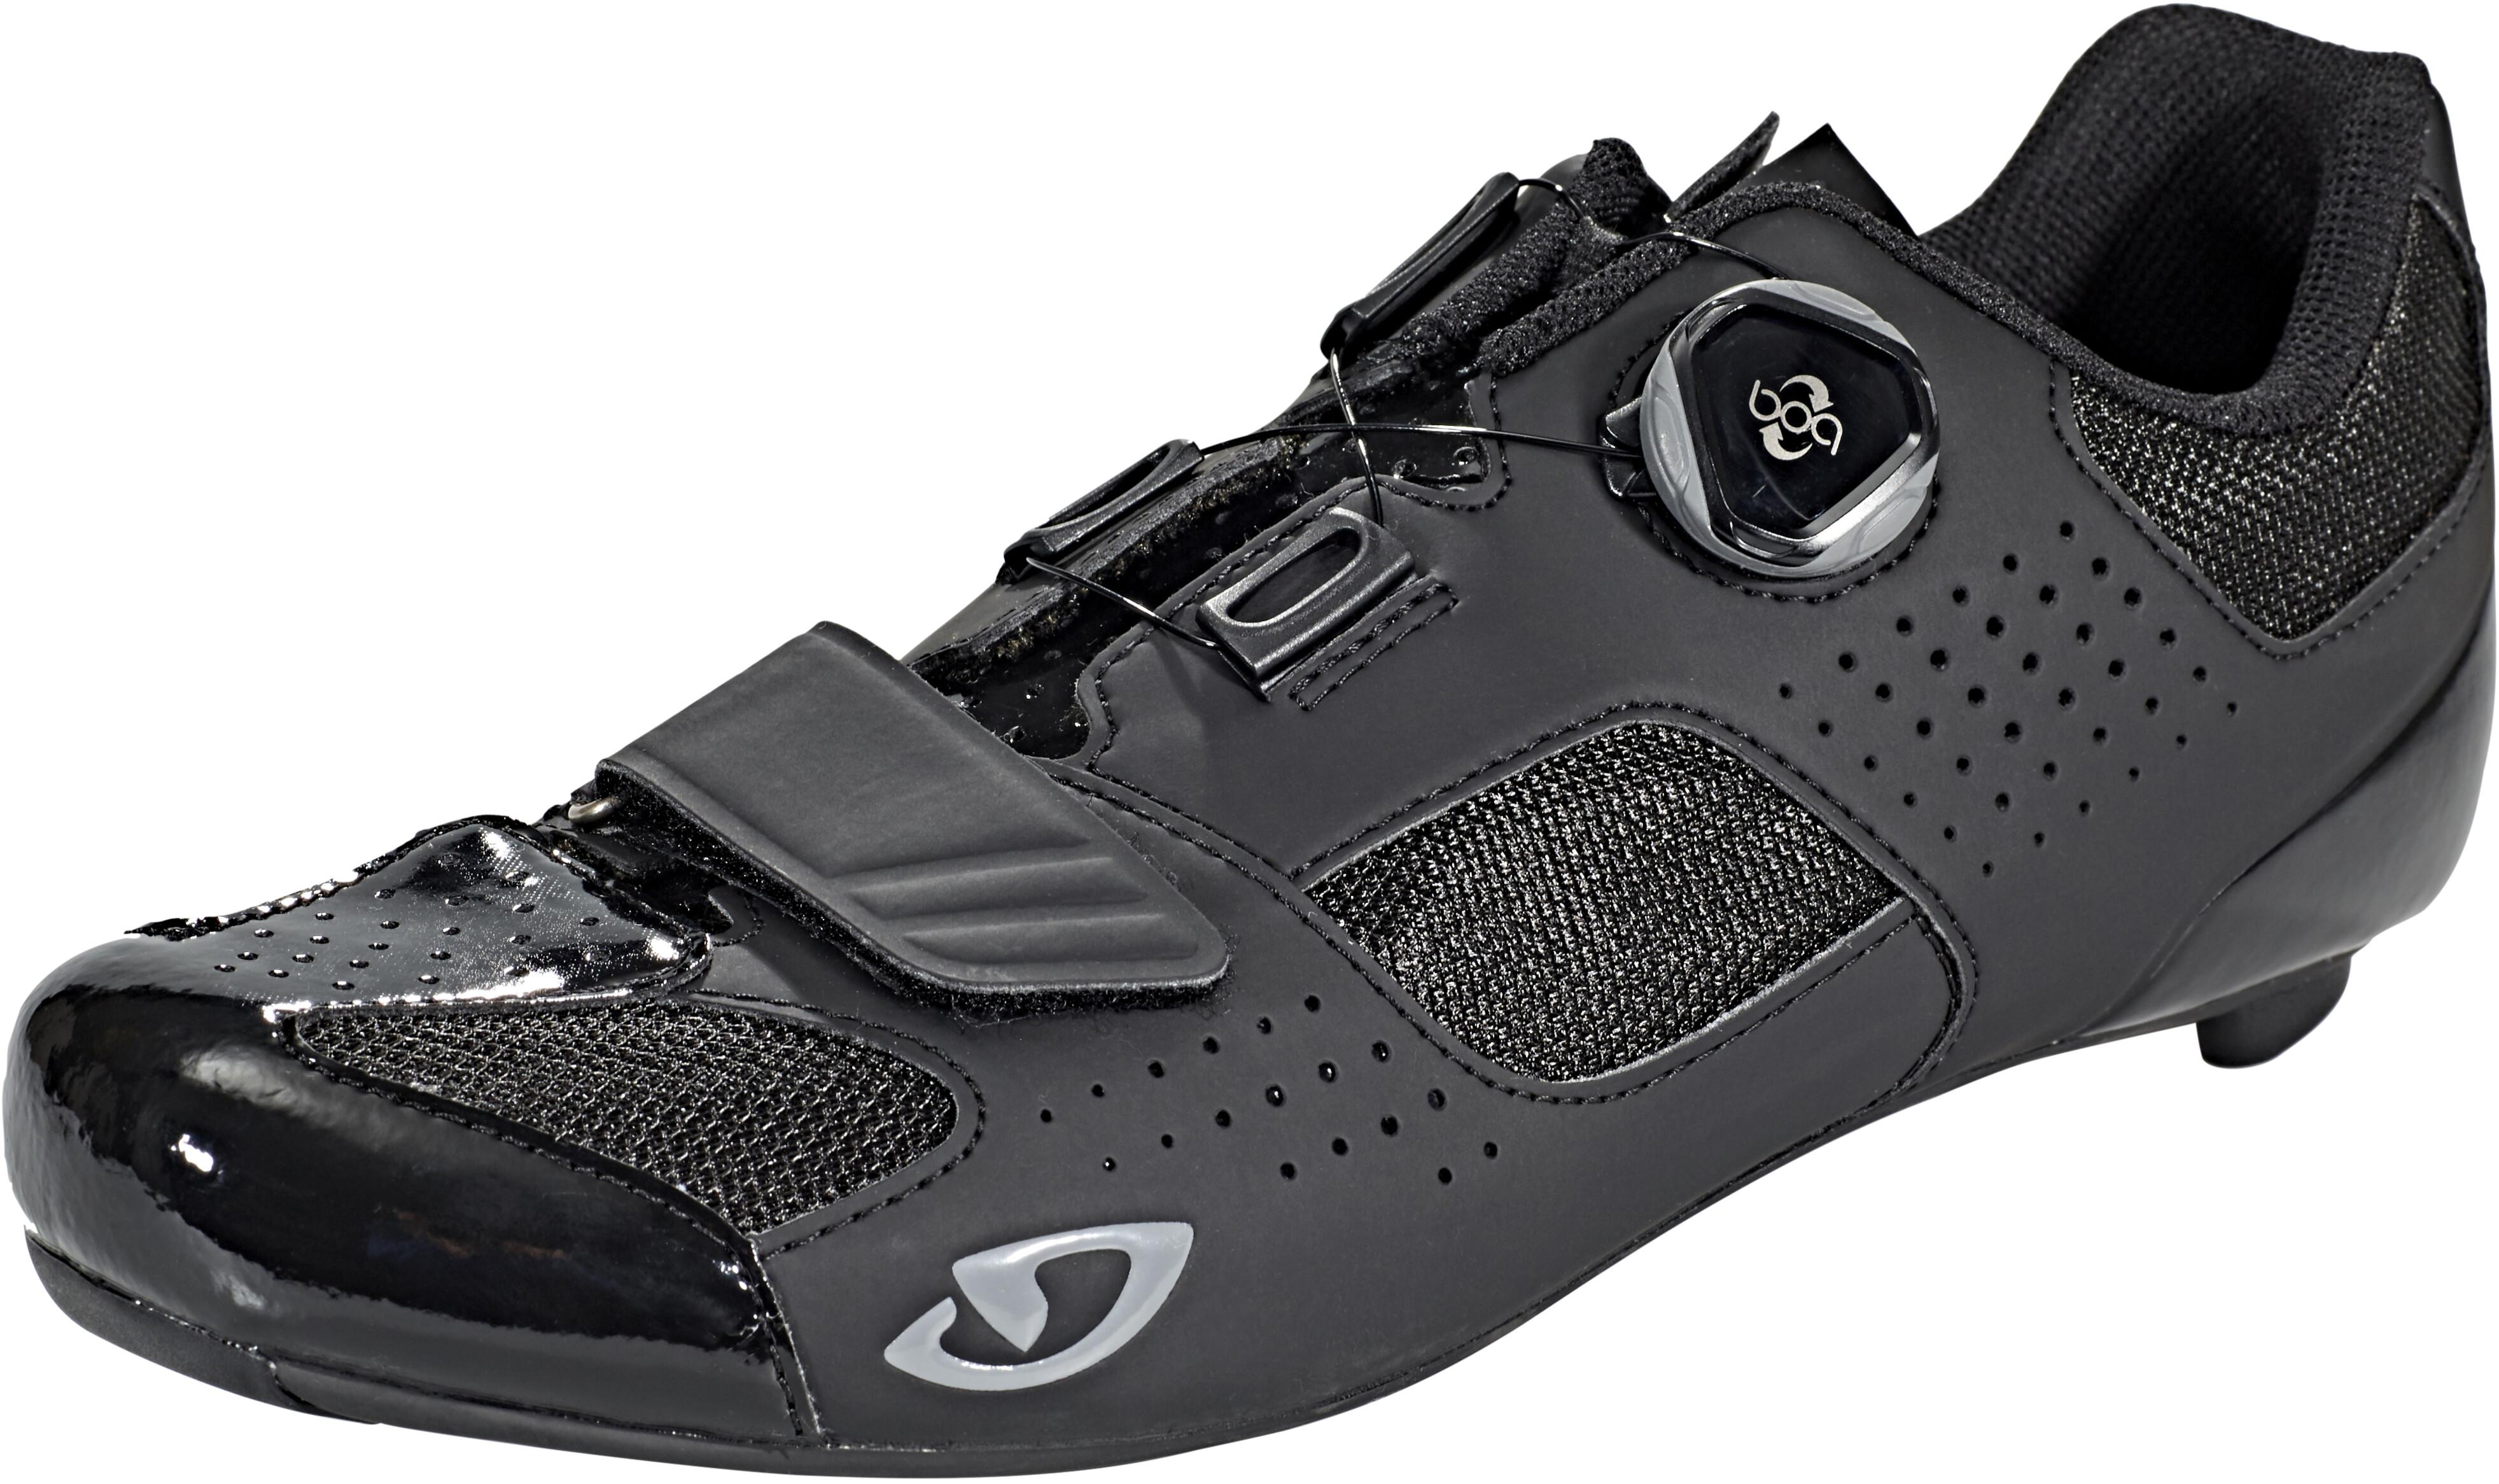 c5ca2a7ac4a Giro Trans Boa - Chaussures Homme - noir - Boutique de vélos en ...